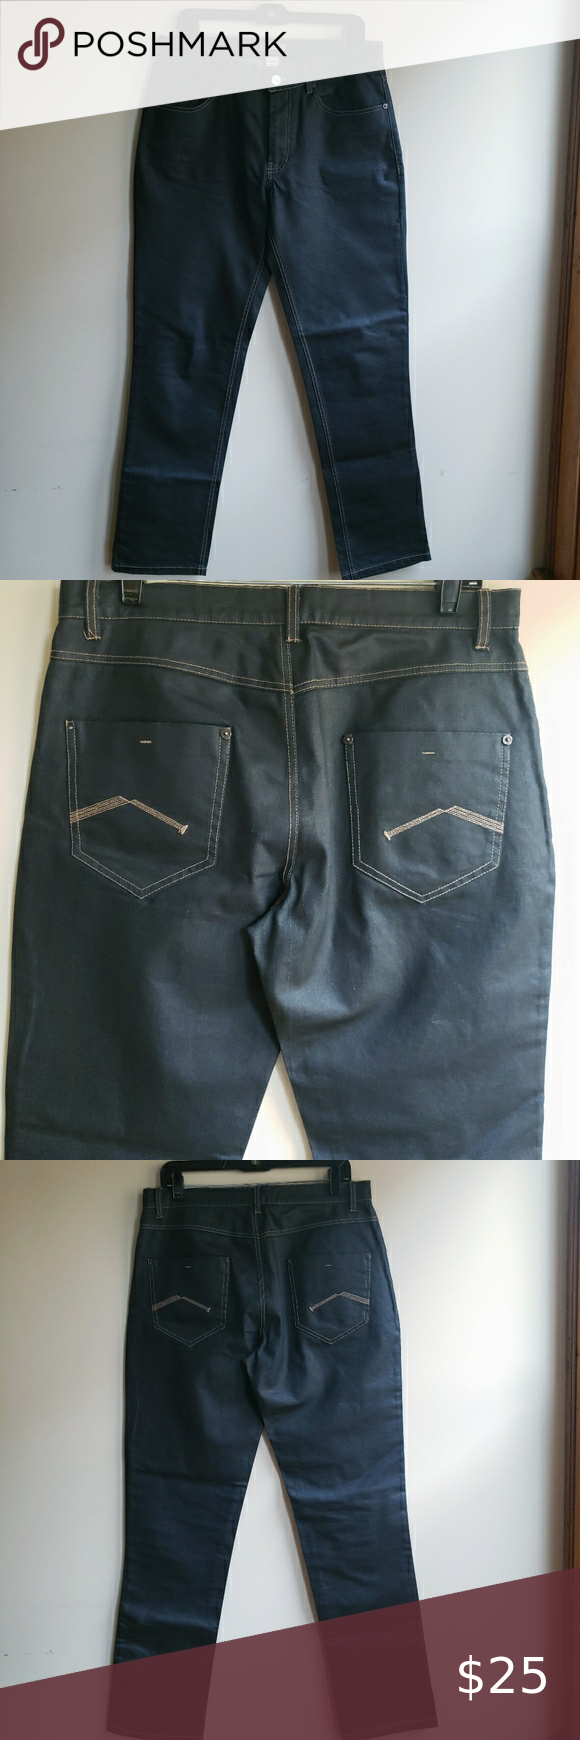 Men S Alkemy Dark Blue Jeans Size 32 Straight Leg Alkemy Men S Jeans Size 32 Great Condition See Pics For Measur Dark Blue Jeans Mens Straight Jeans Blue Jeans